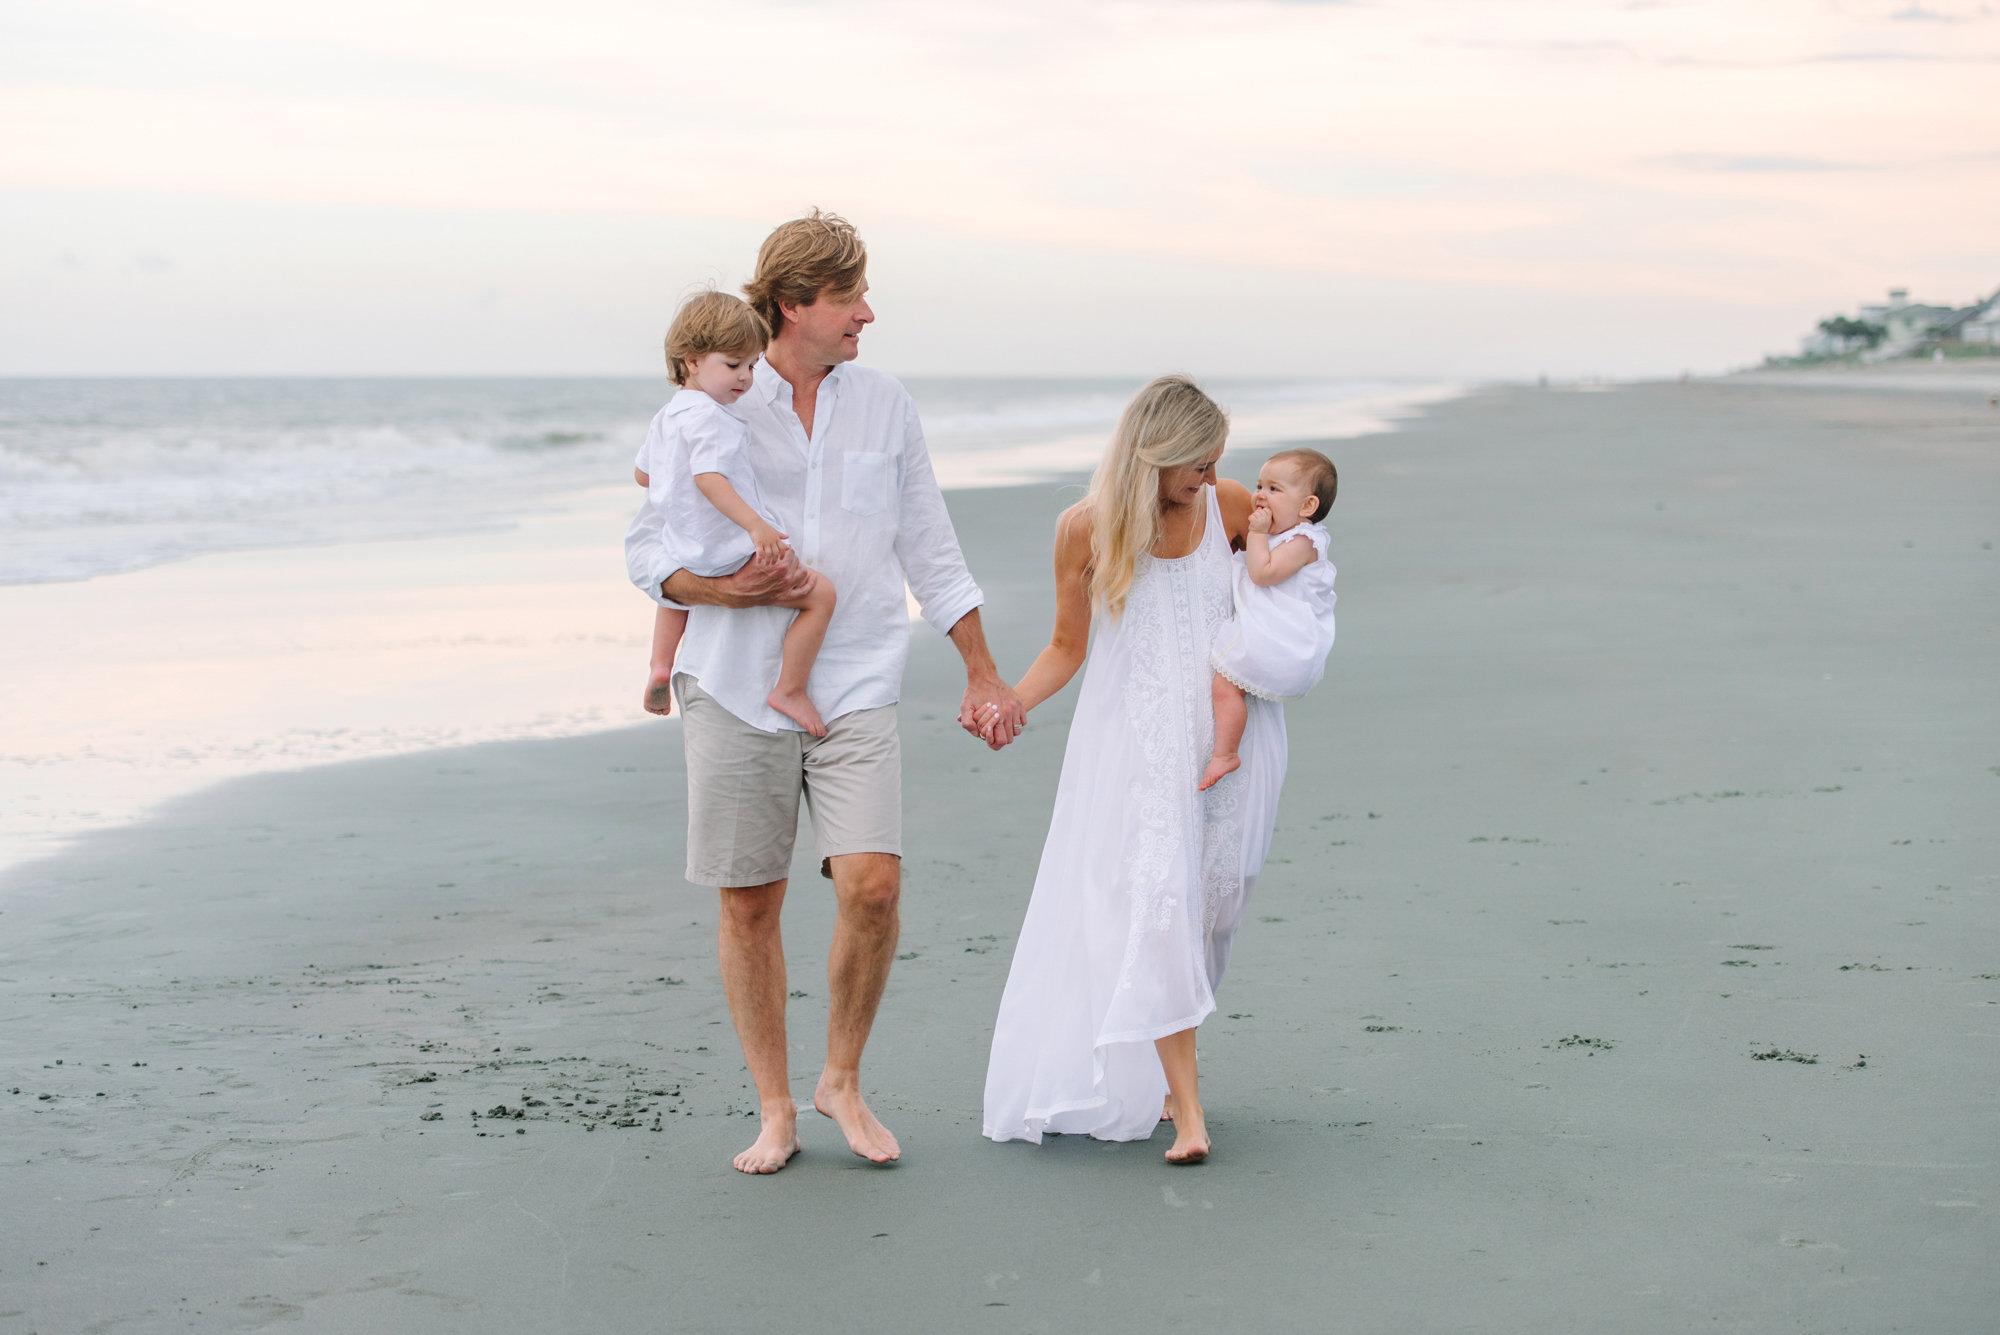 Myrtle Beach Family Photos - Top Family Photographer in Myrtle Beach and Pawleys Island